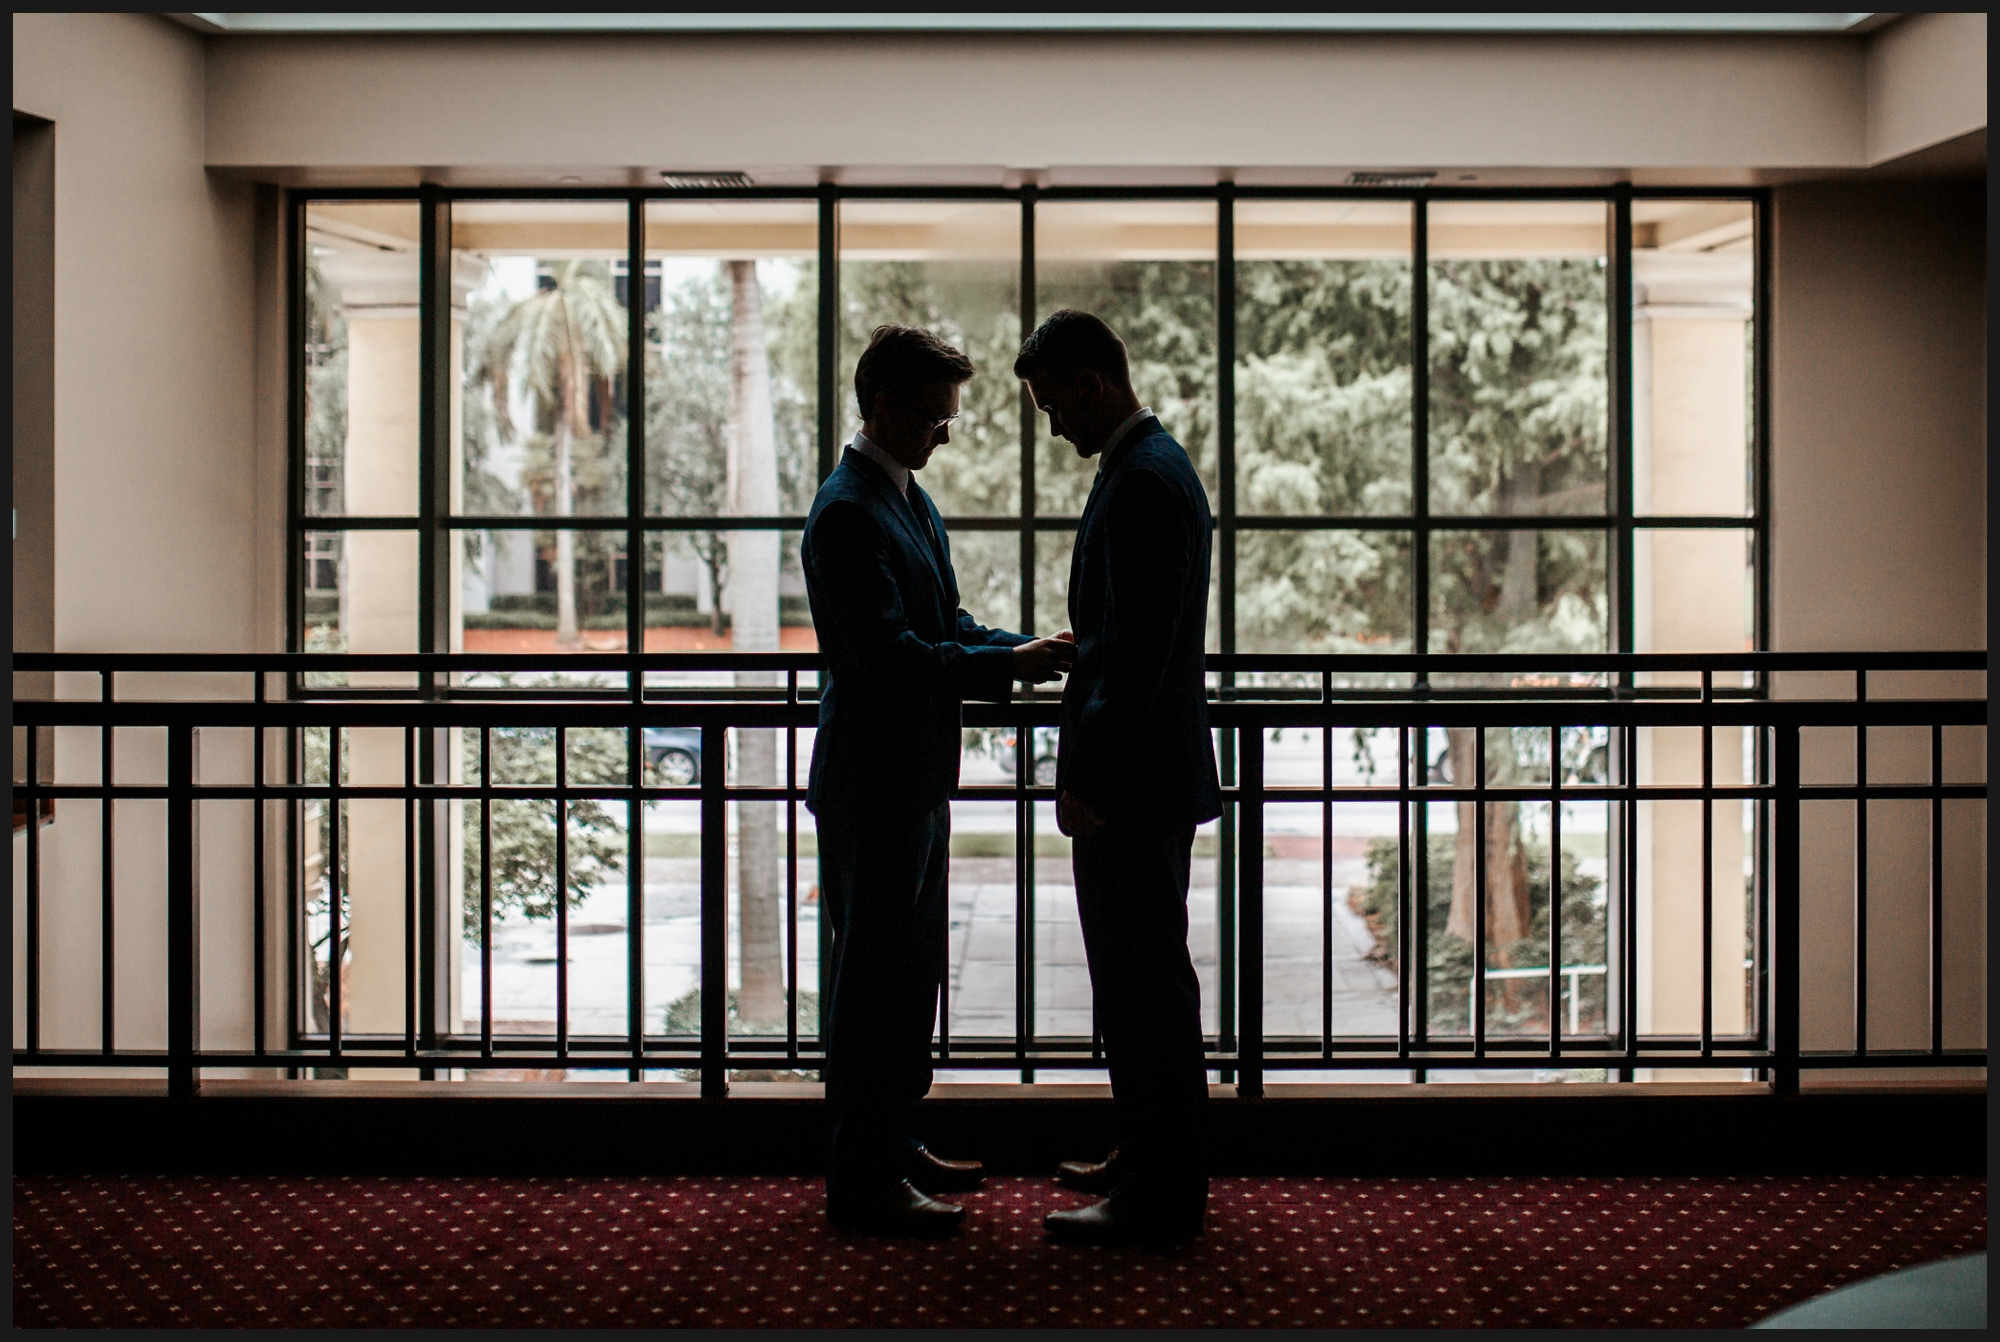 Orlando-Wedding-Photographer-destination-wedding-photographer-florida-wedding-photographer-bohemian-wedding-photographer_0041.jpg